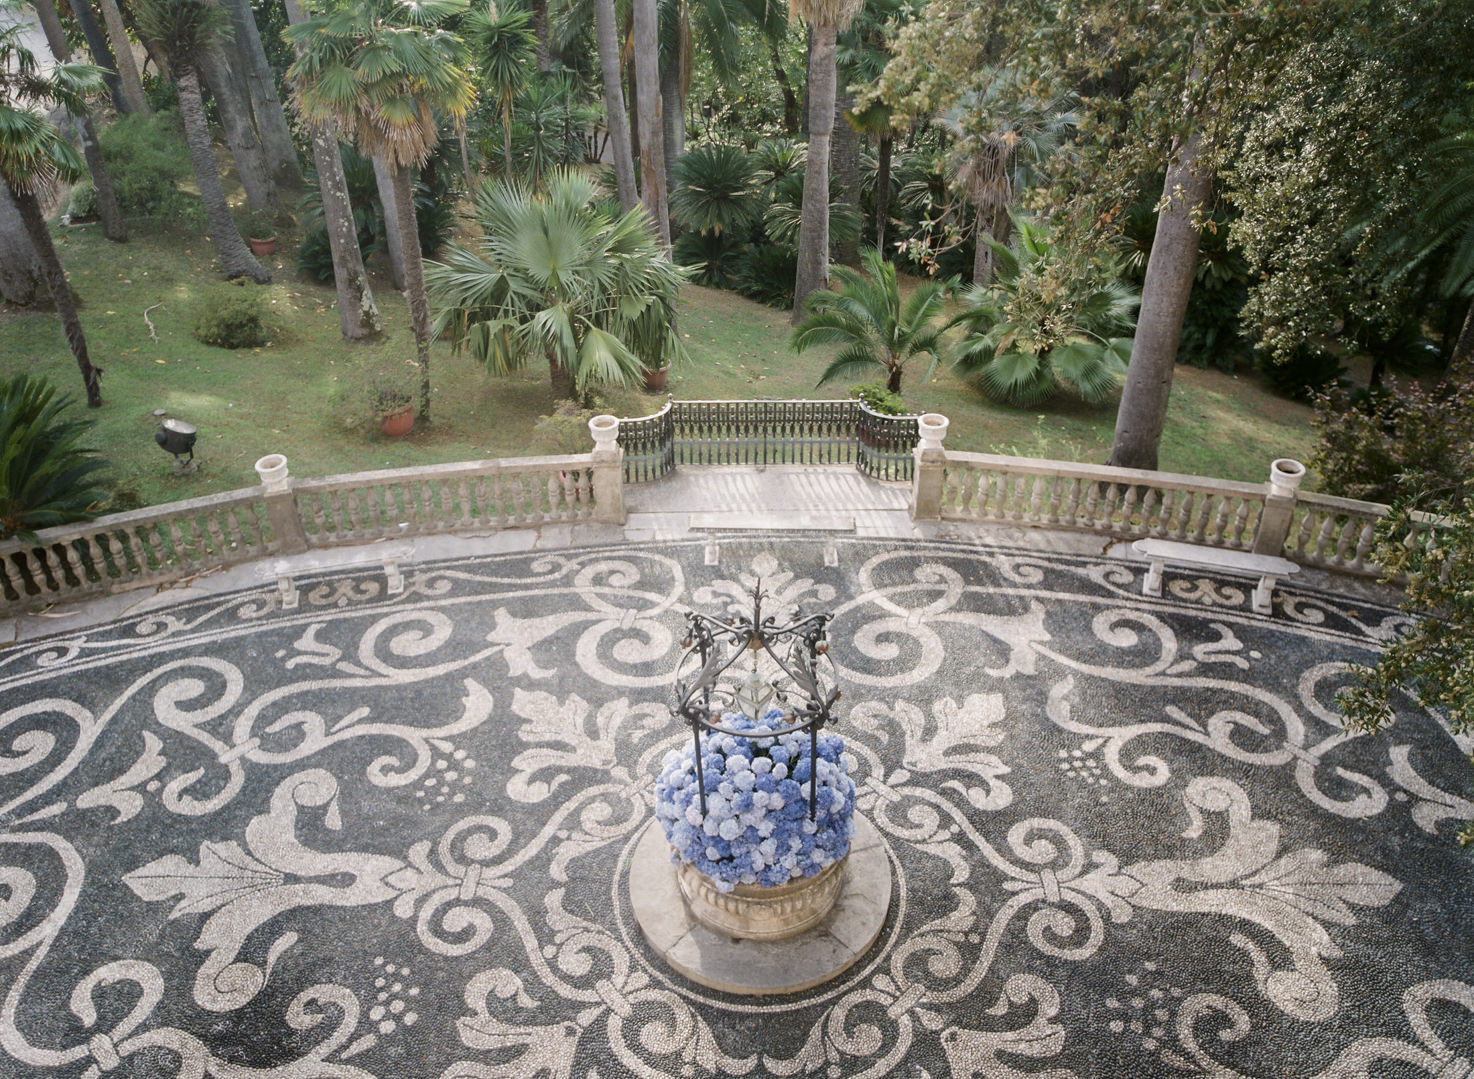 Mosaic pavement at Villa Durazzo